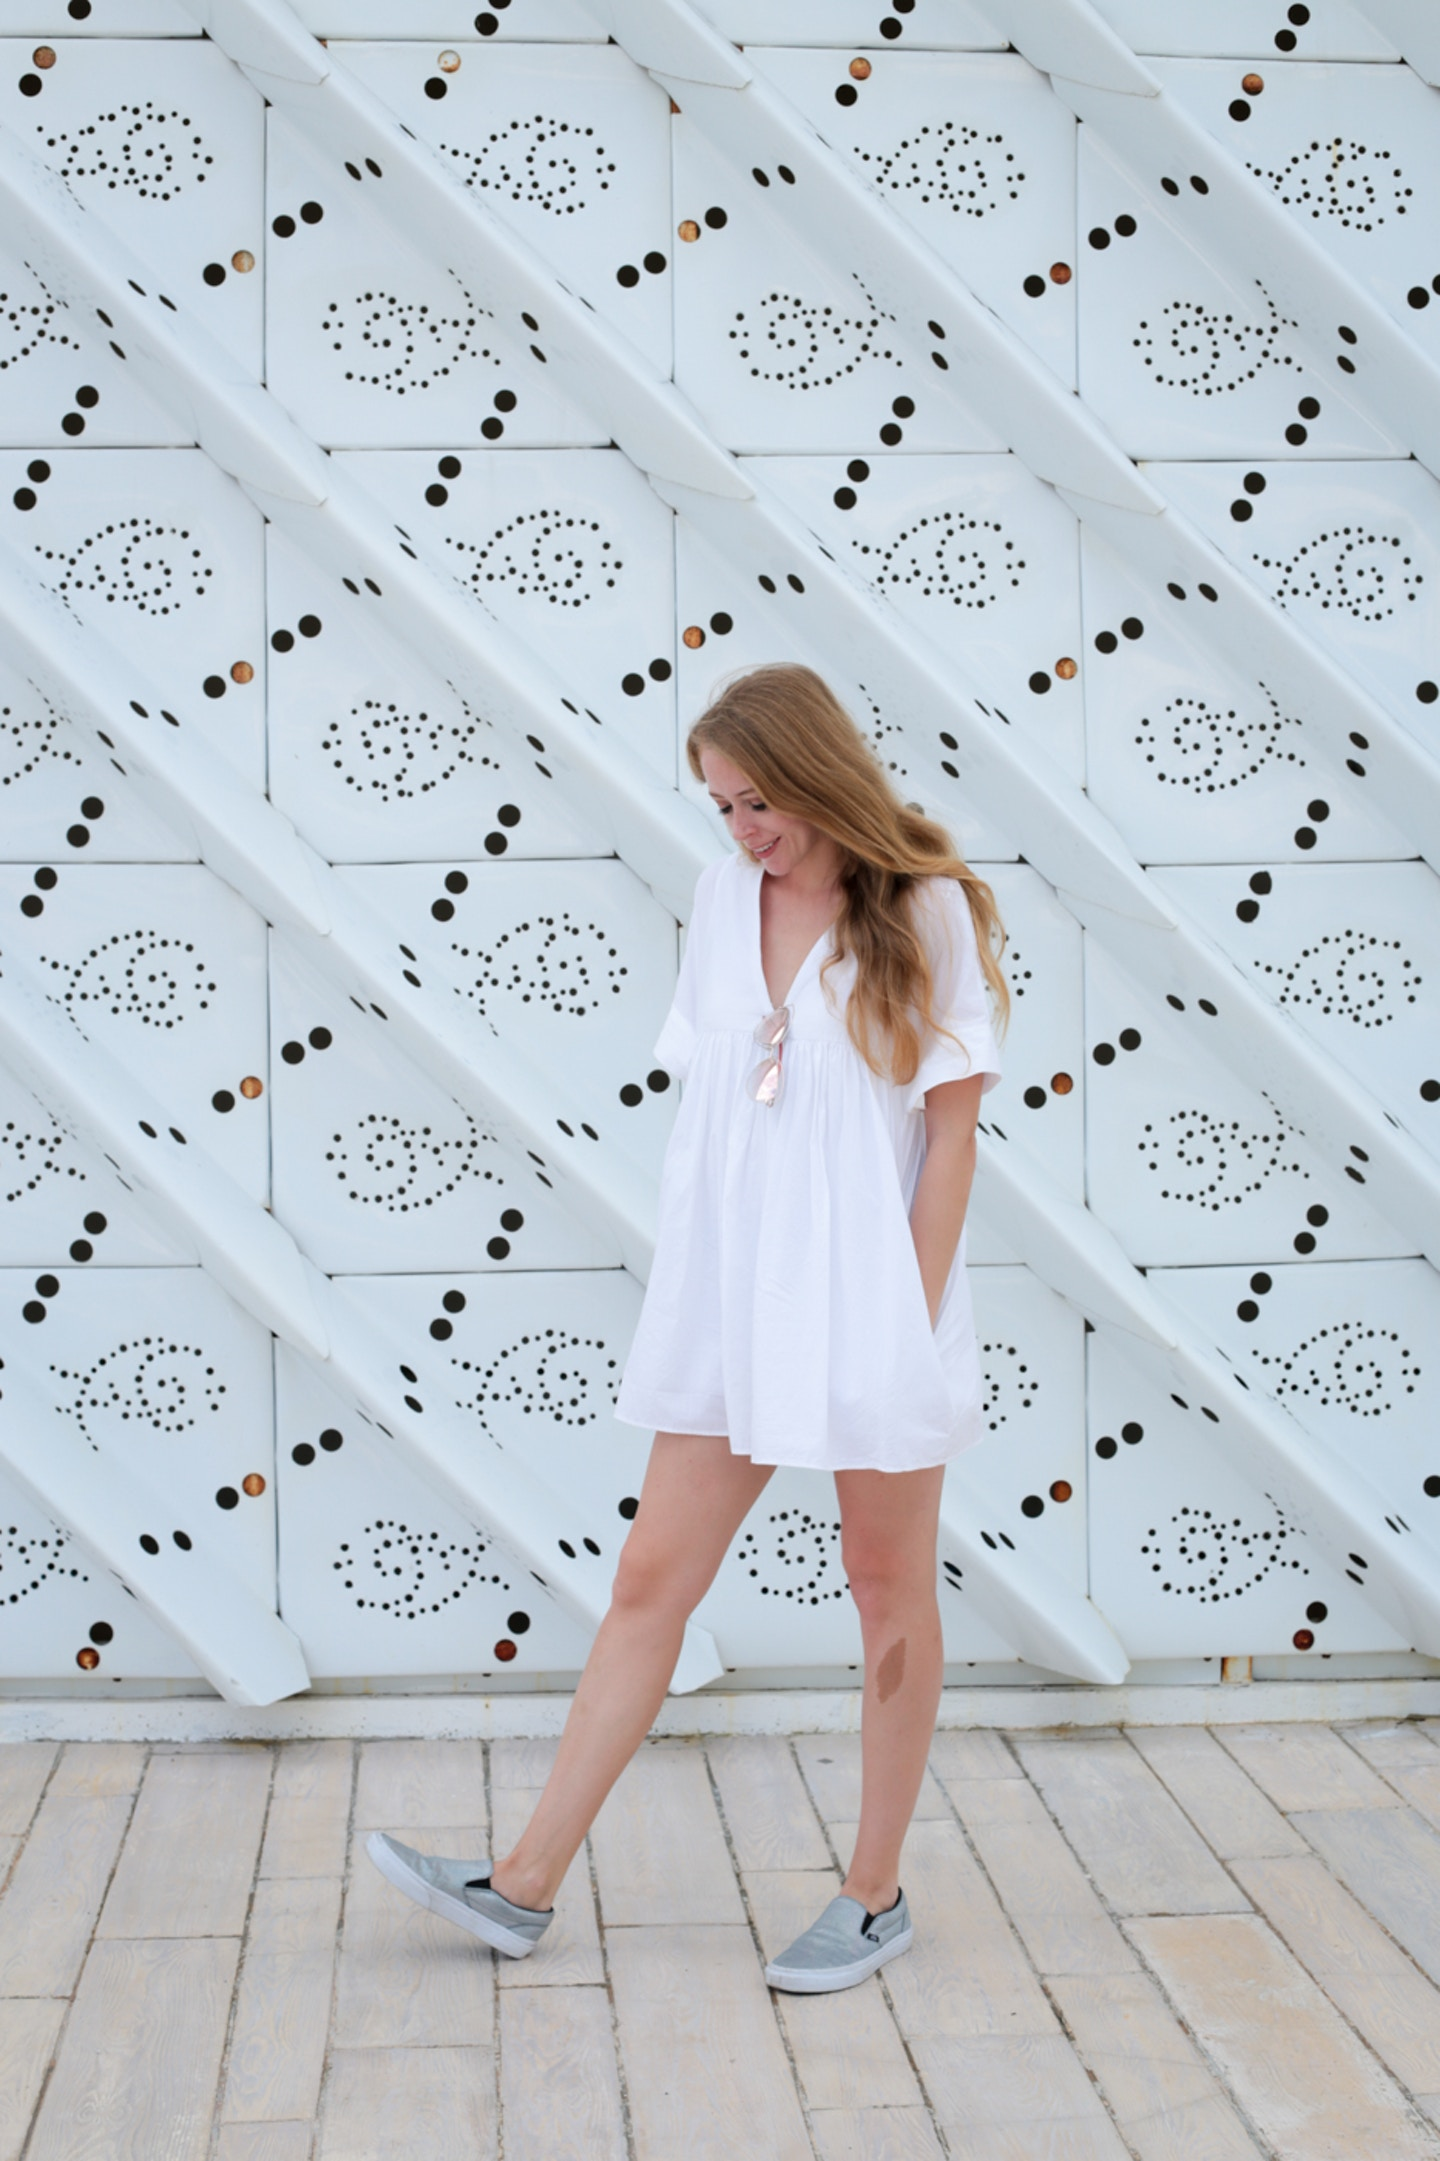 White & Holo Sneakers